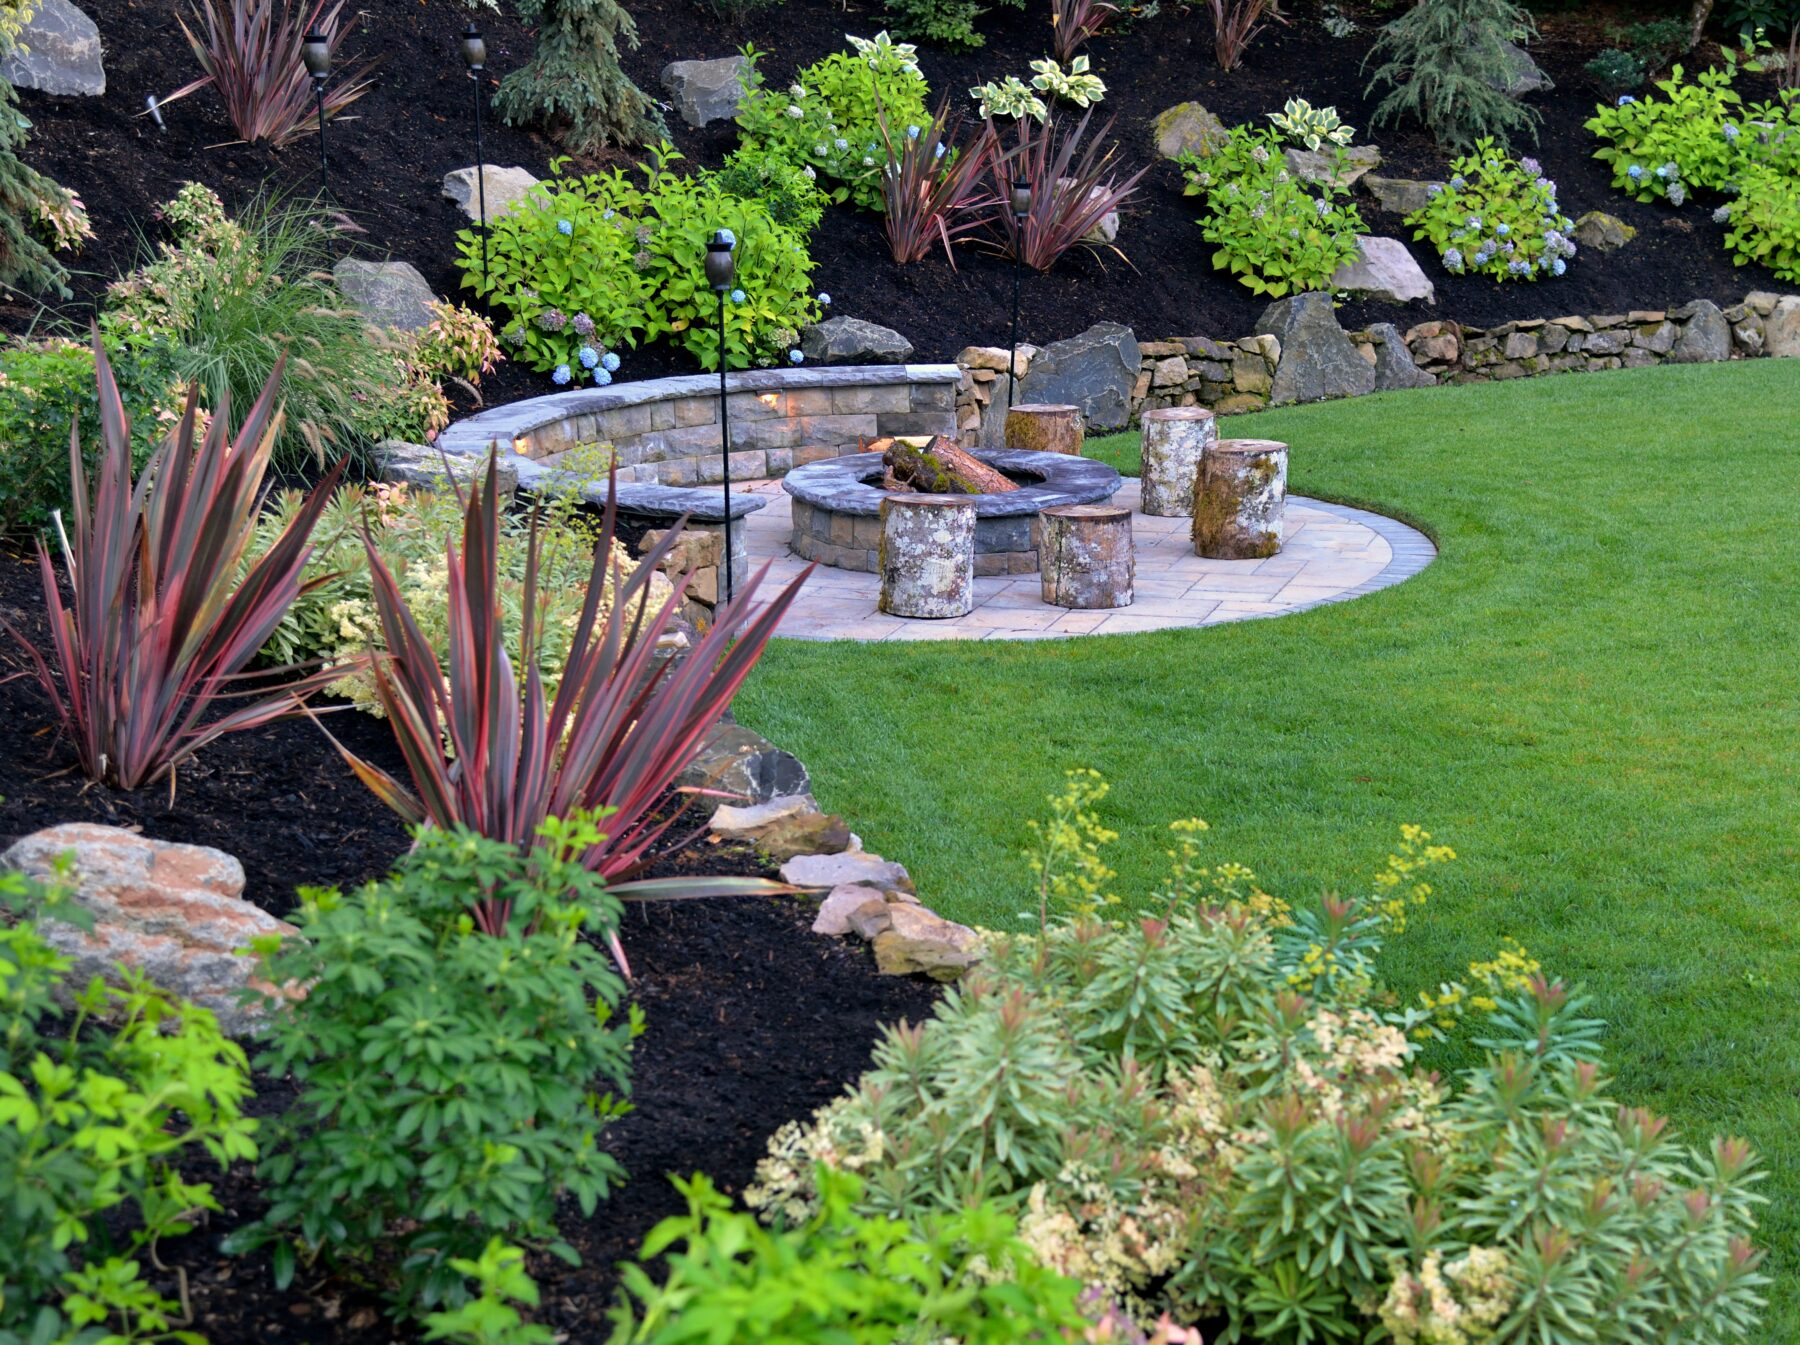 An example of Portland landscape design and landscape construction work